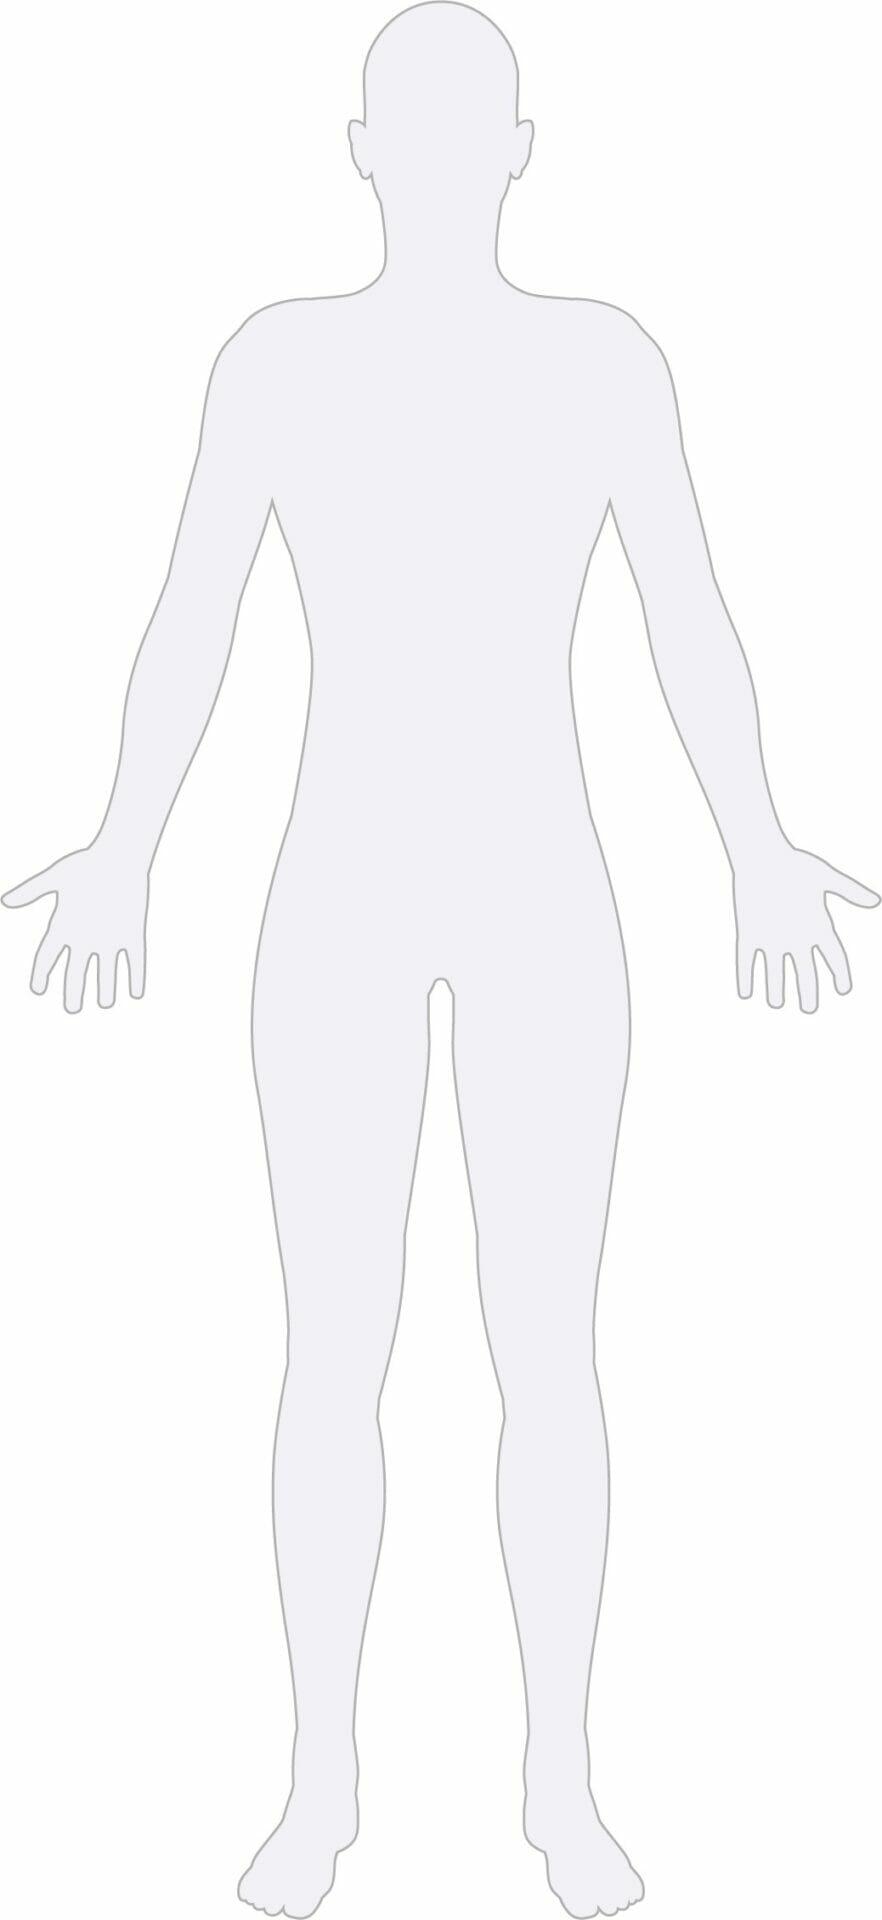 Orthopedic Body Chart